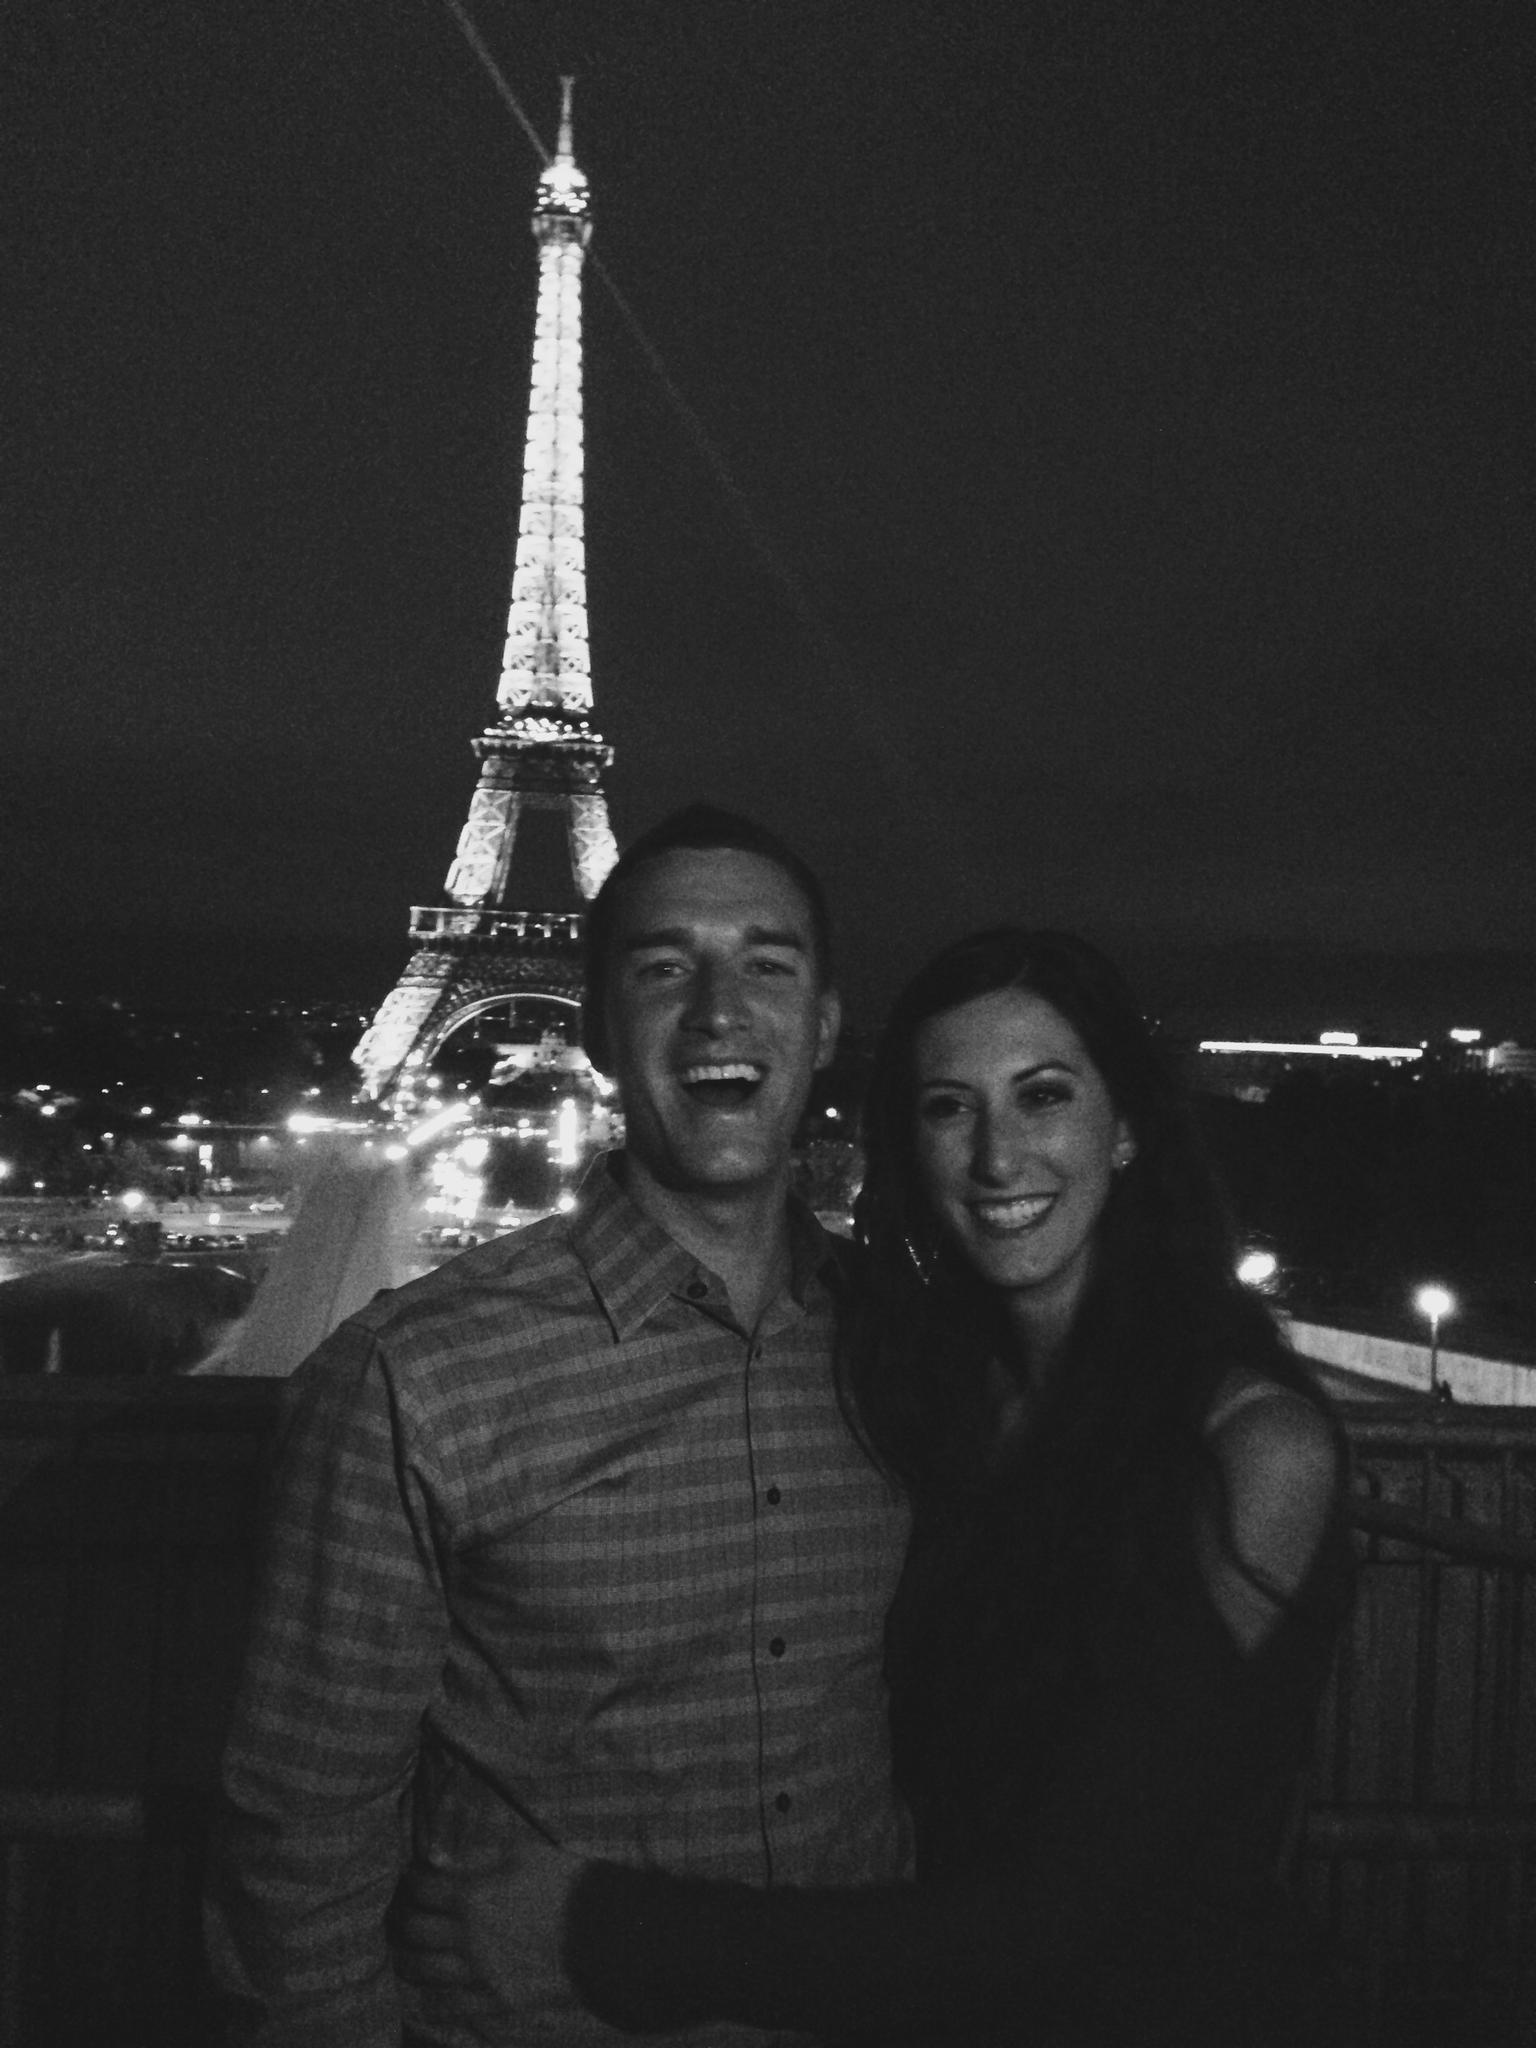 Our 3rd anniversary - Paris, France